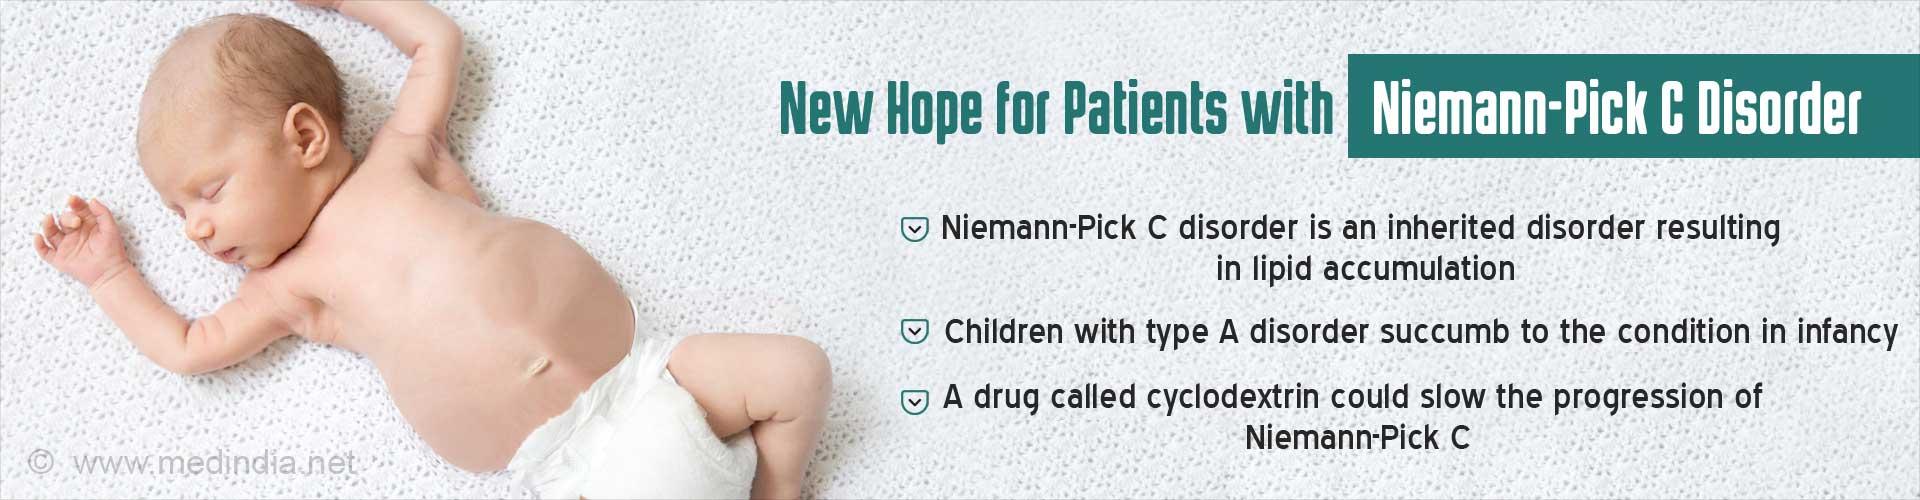 Cyclodextrin Shows Promise in Niemann-Pick Type C Disease